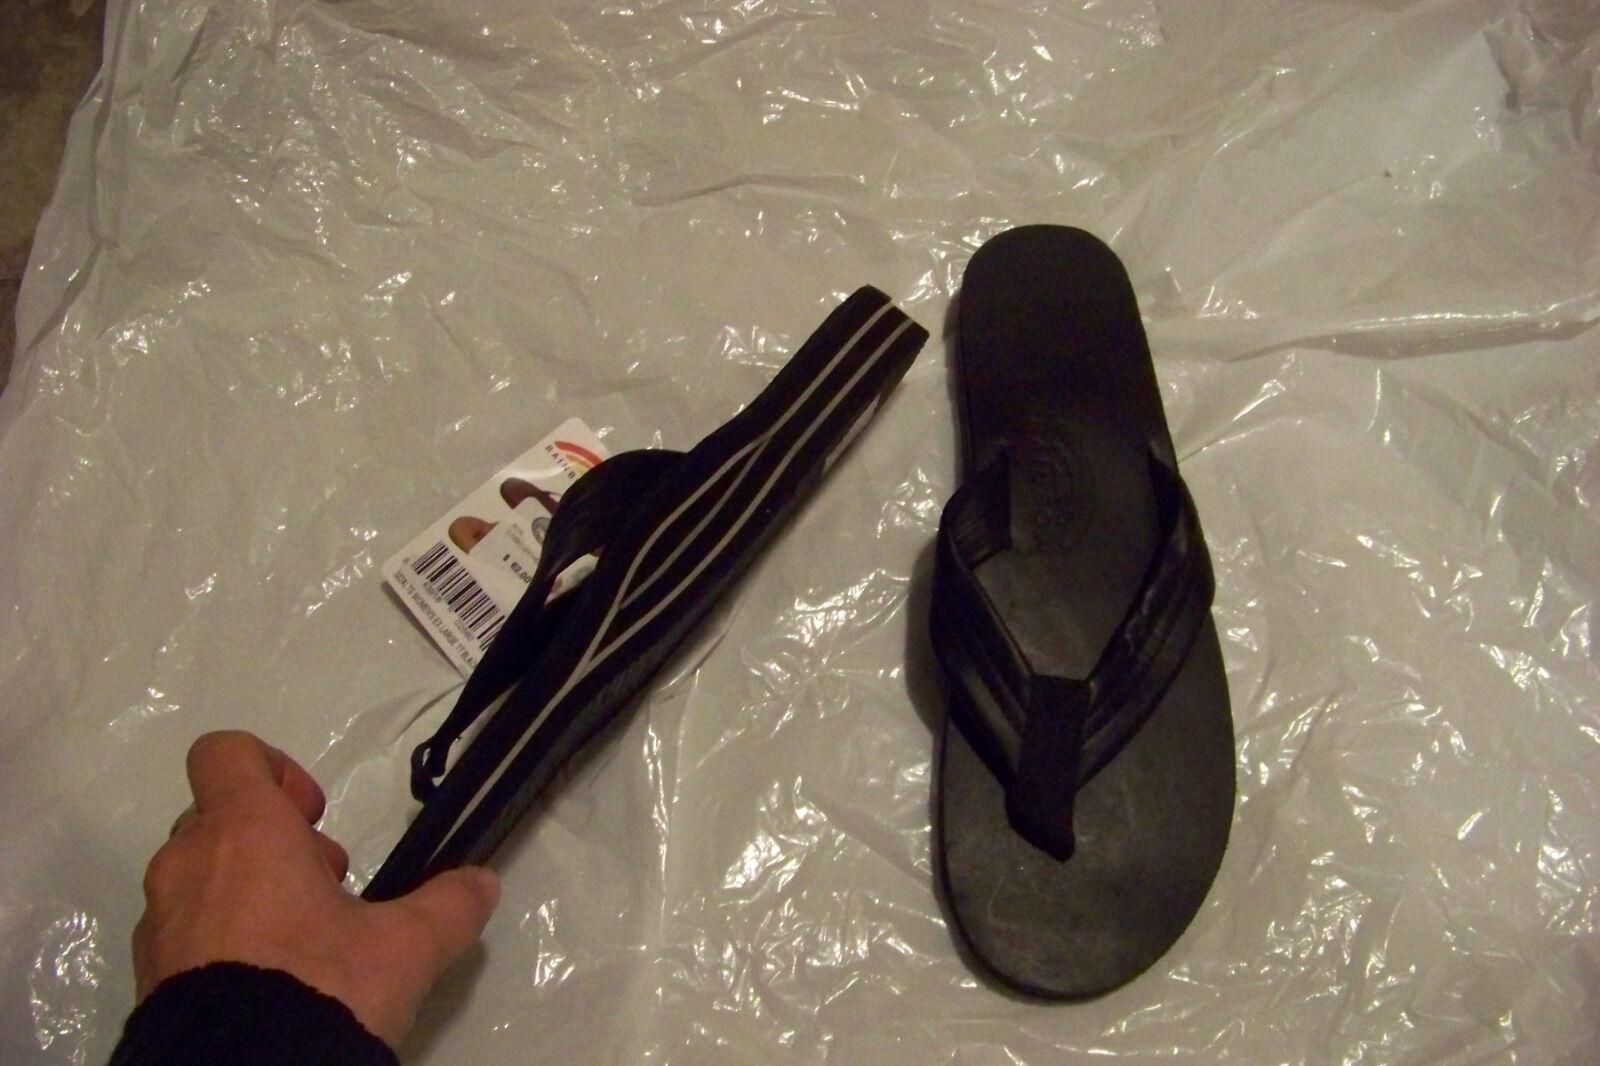 New Damenss rainbow schuhe classic schwarz Leder flip flops Sandales schuhe rainbow xl 8.5-9.5 06fe66